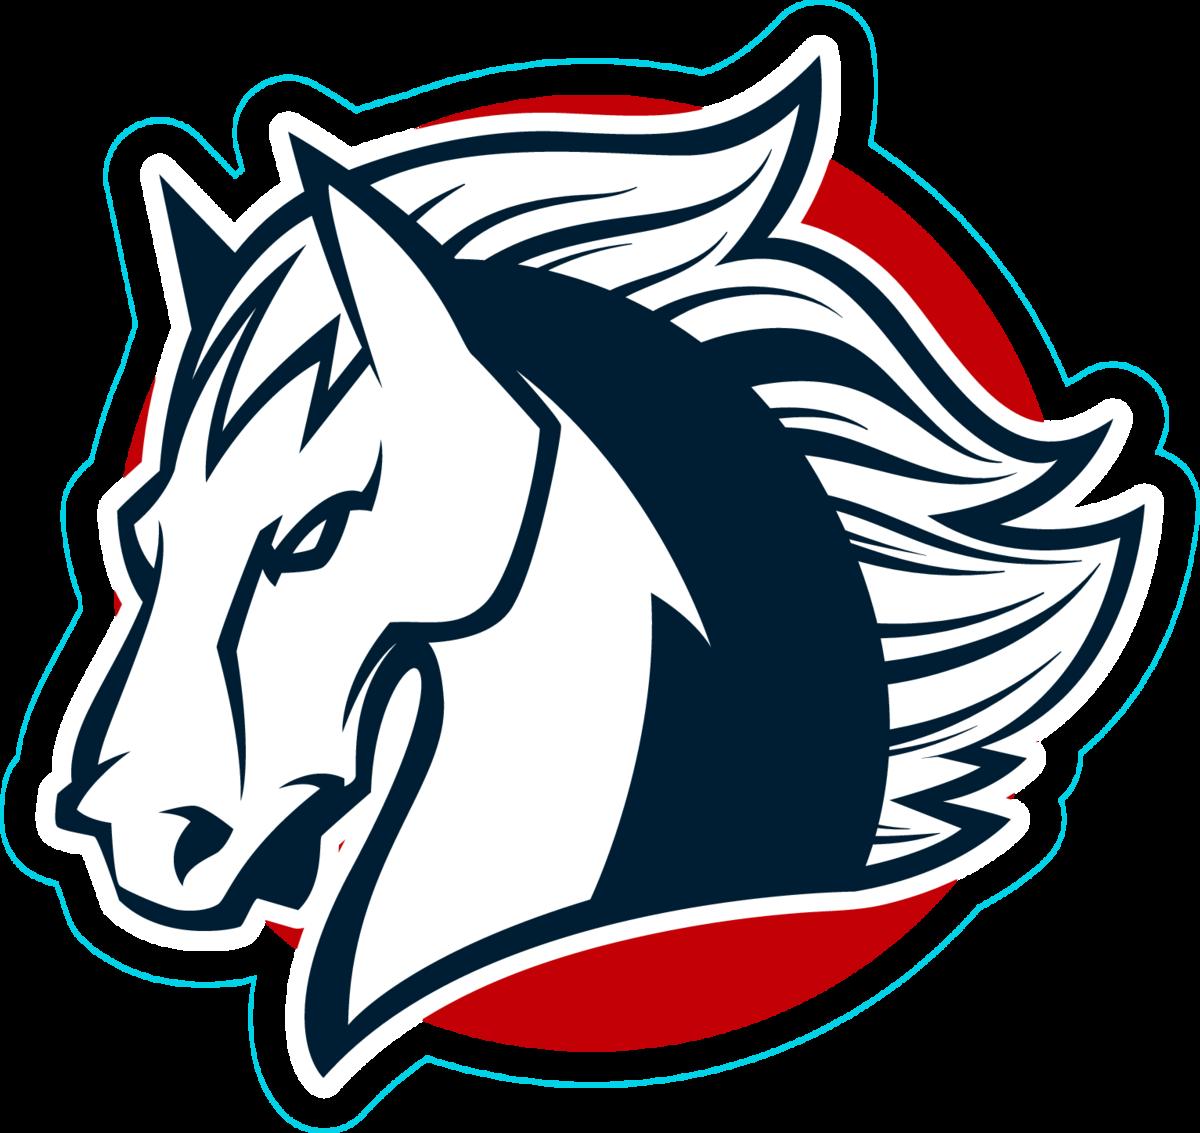 American Horse Head Mascot Sticker